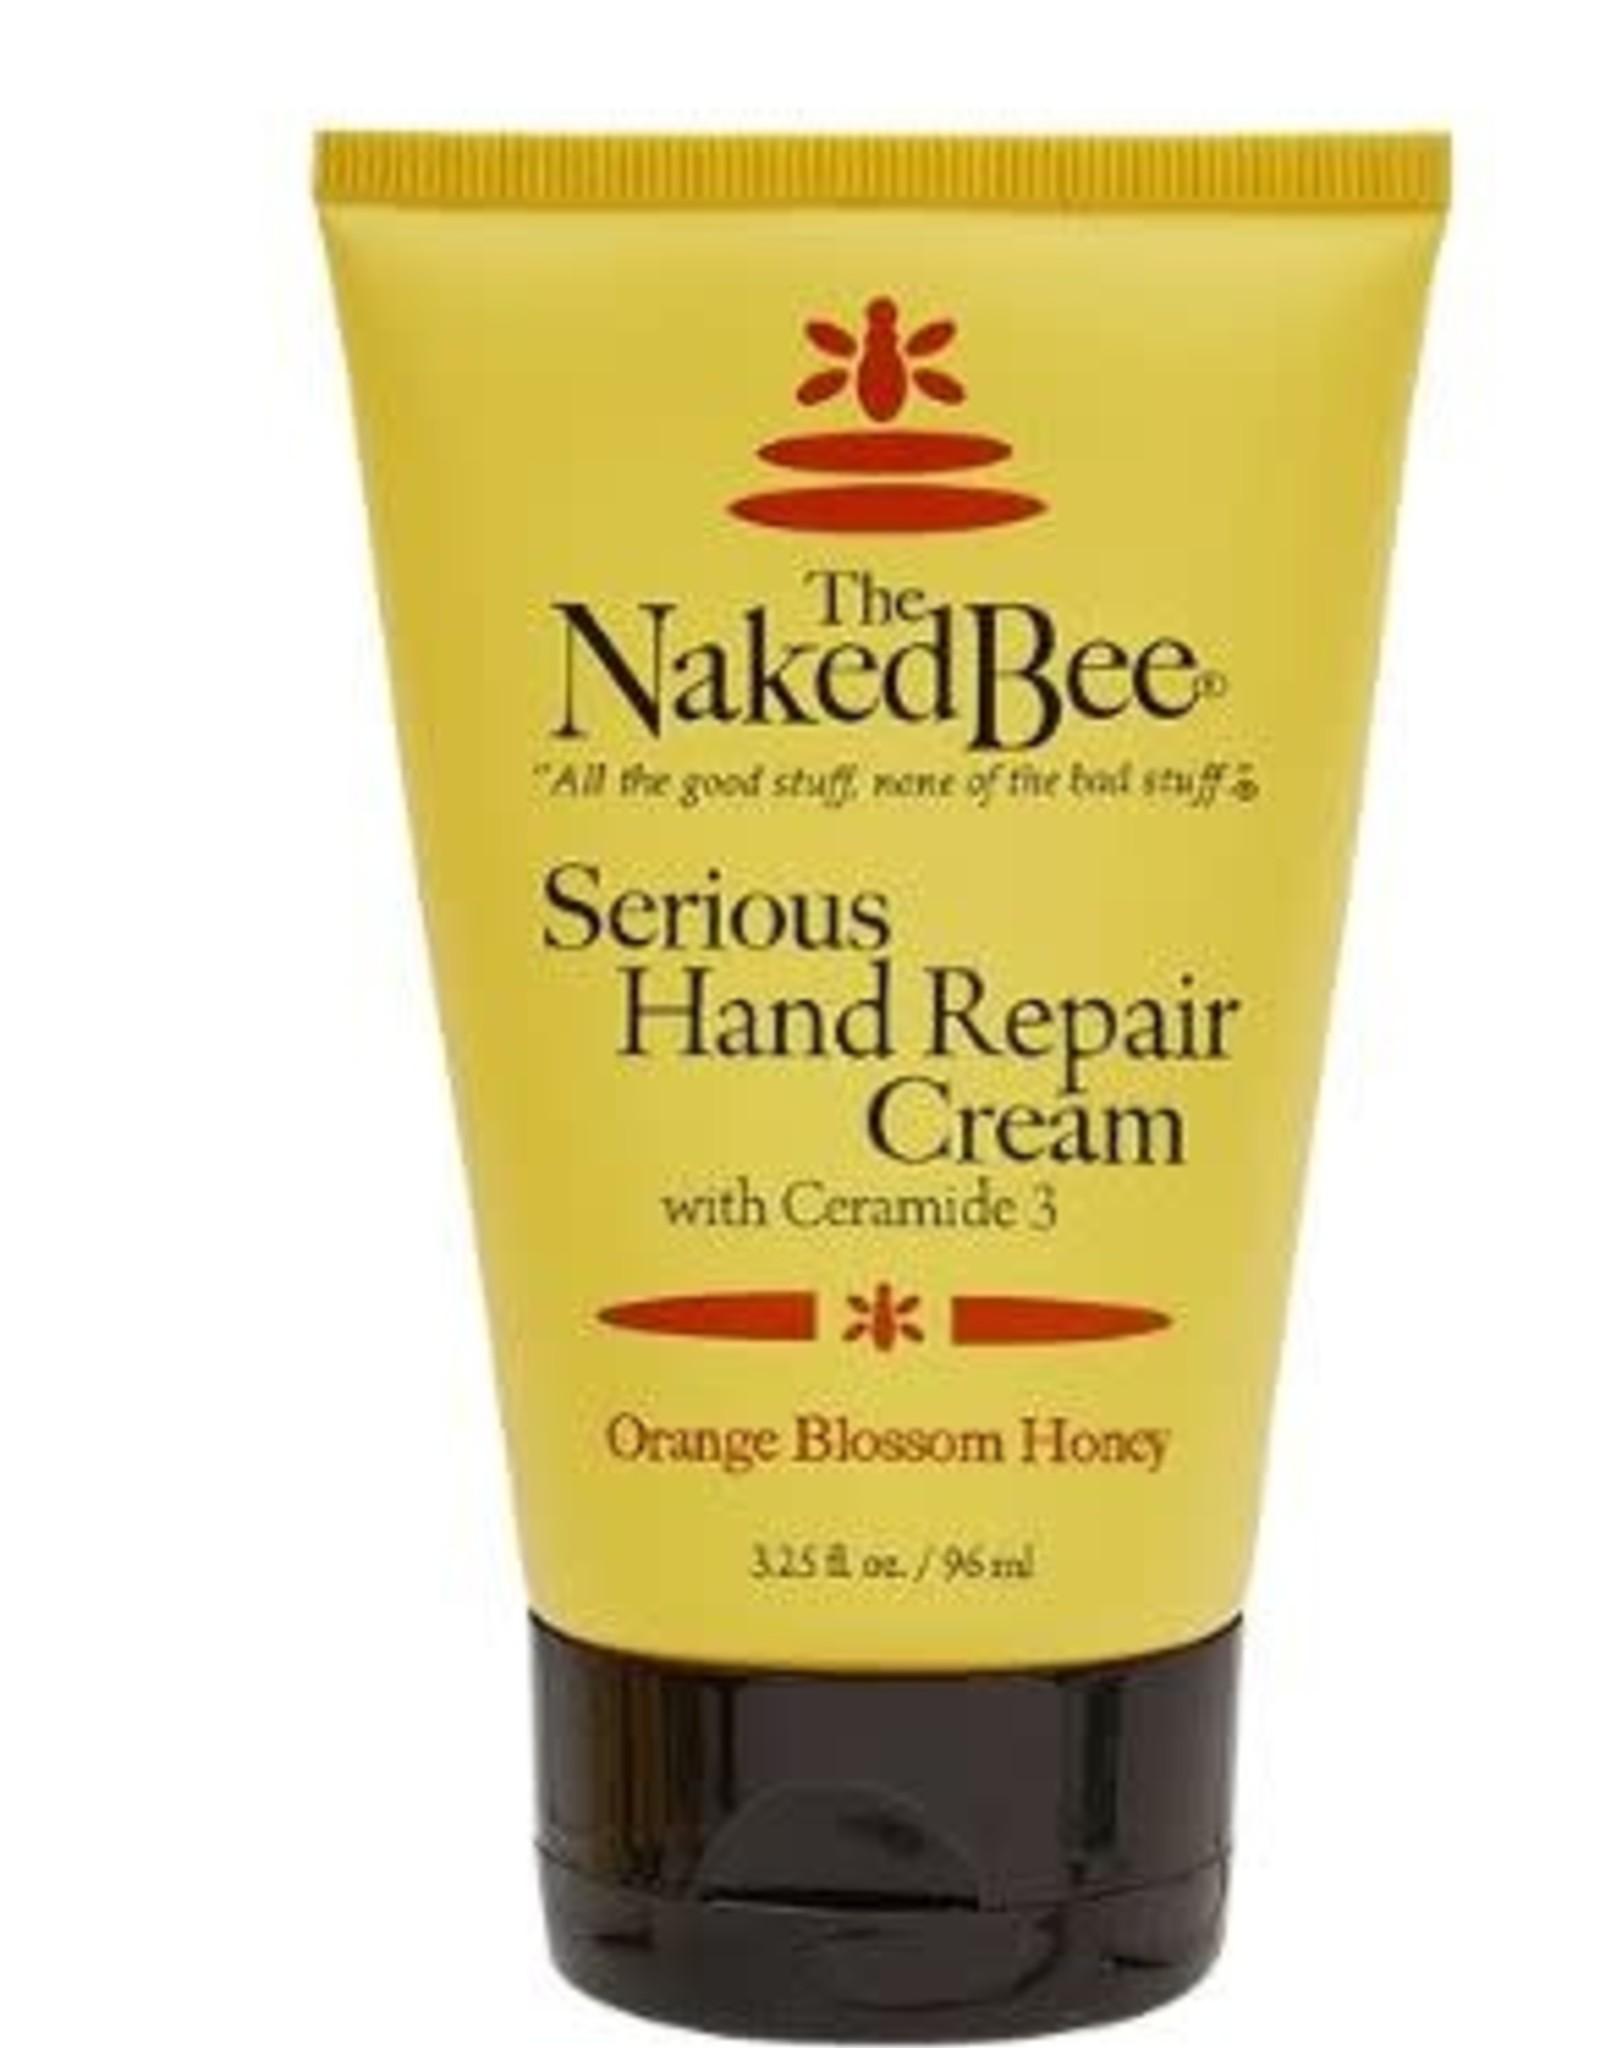 The Naked Bee The Naked Bee | Orange Blossom & Honey Serious Hand Cream 3.25oz